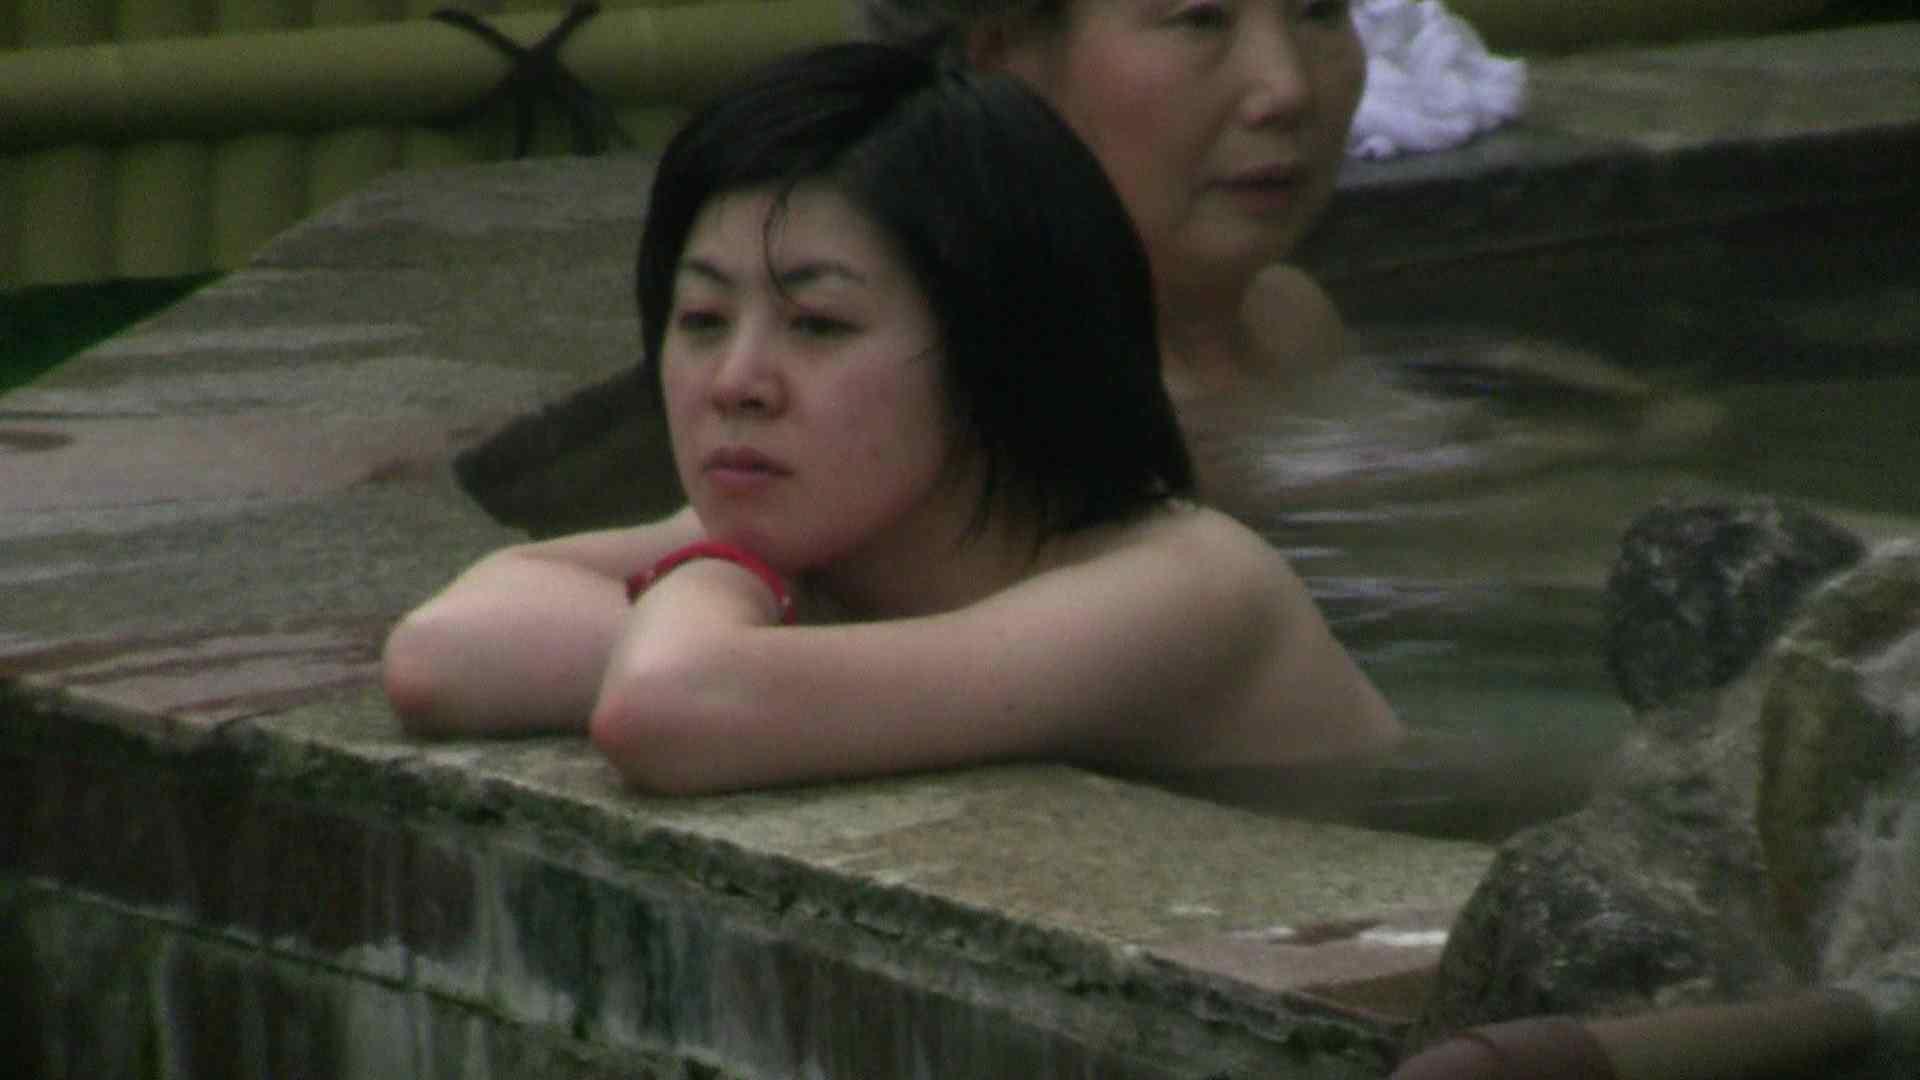 Aquaな露天風呂Vol.685 OLのプライベート  13pic 3